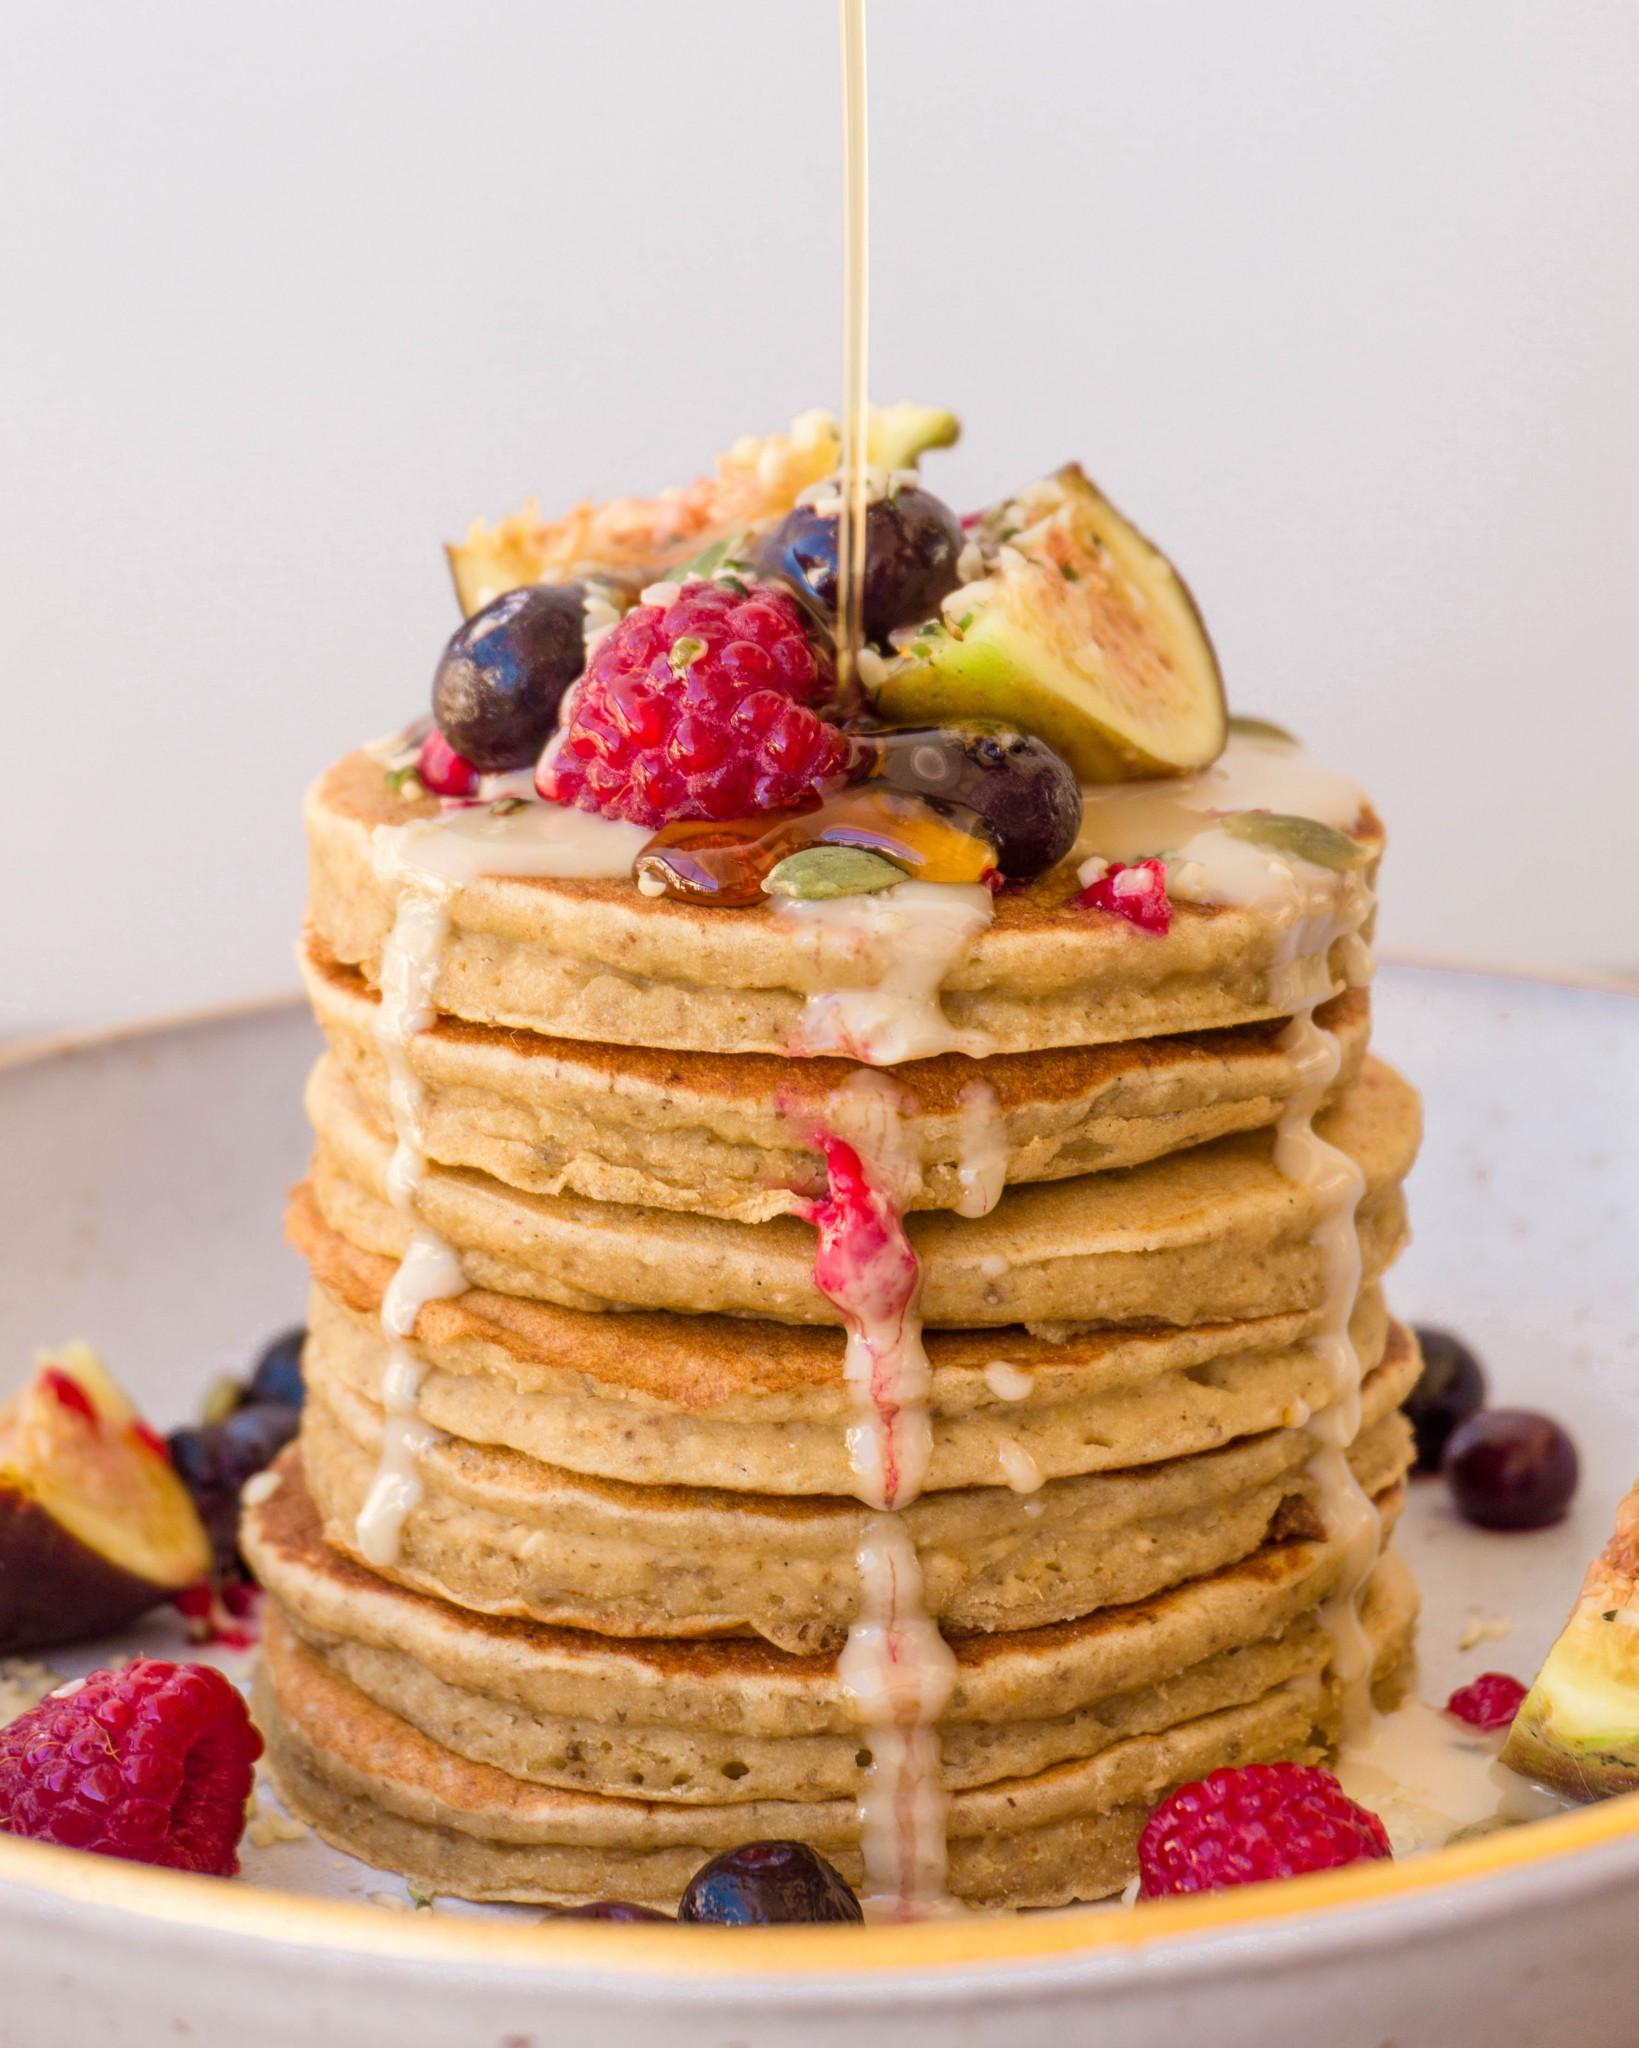 Vegan Protein Powder Pancakes  Vegan Protein Pancakes The Tasty K